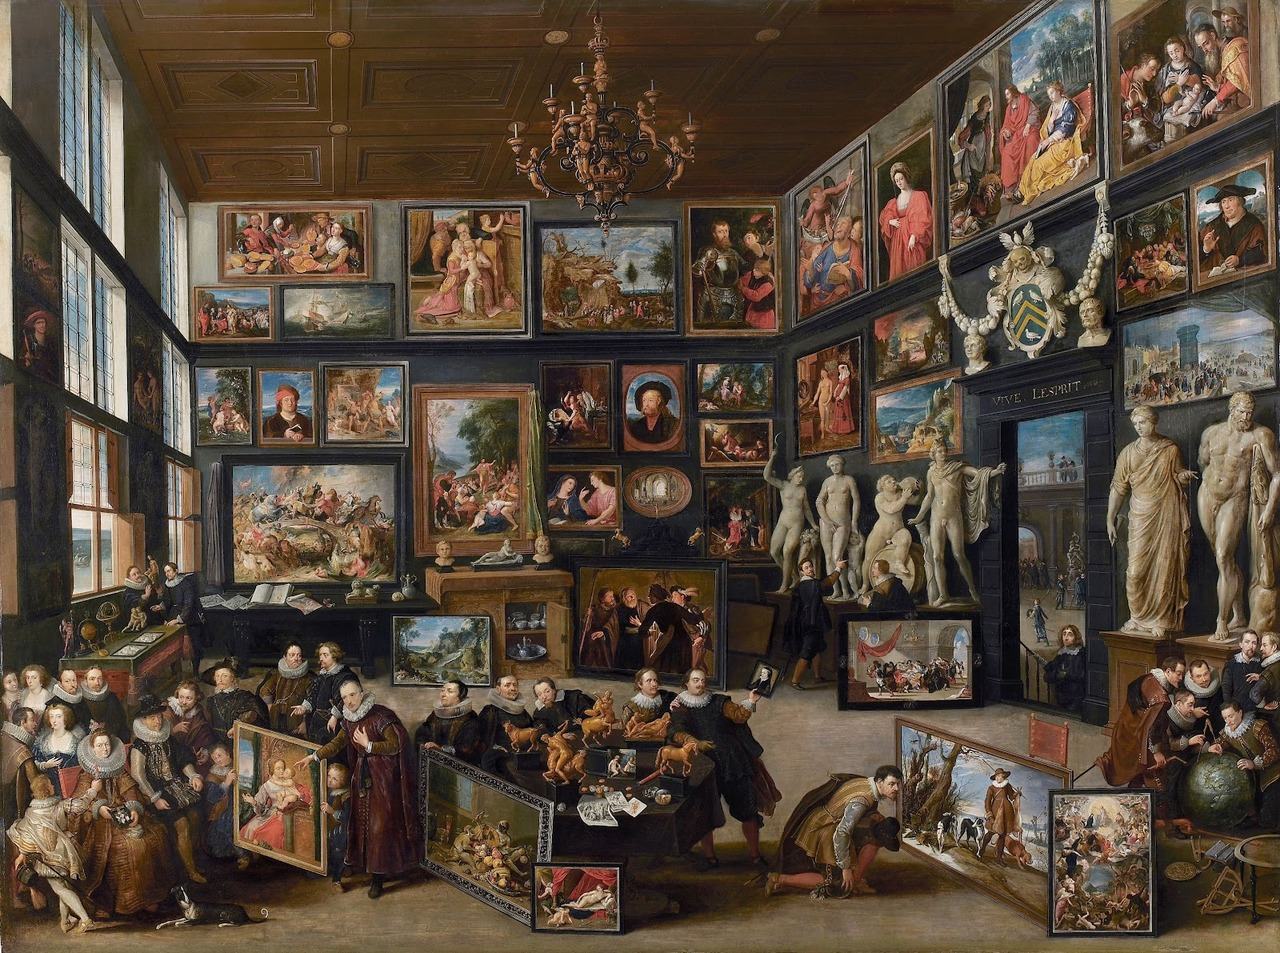 Cabinet d'amateur de Cornelis van der Geest